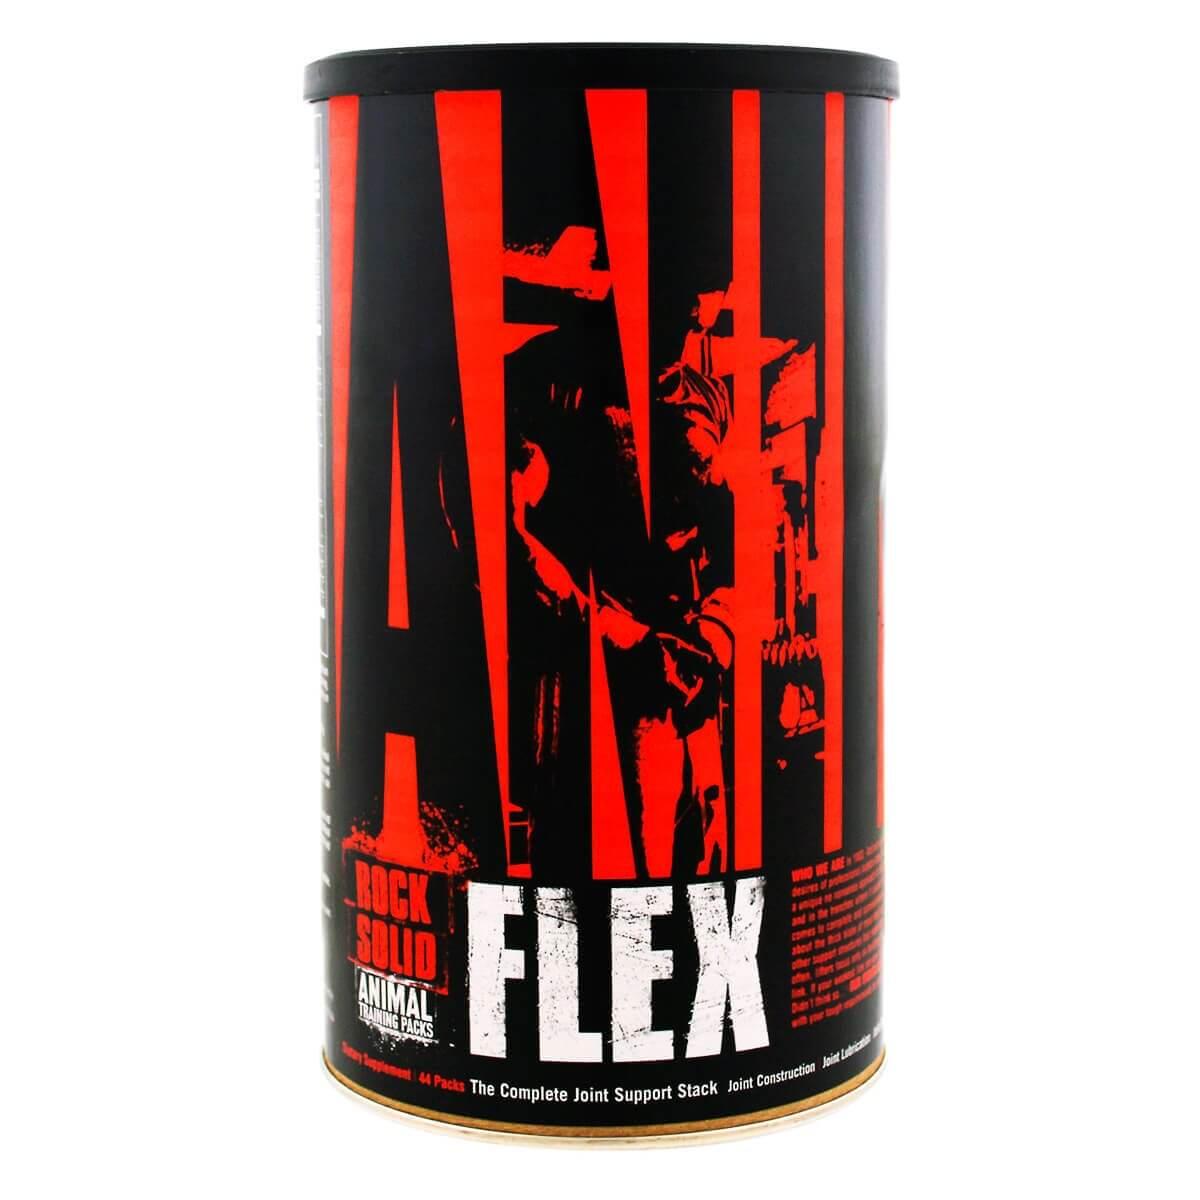 Animal Flex Universal Nutrition - 44 packs